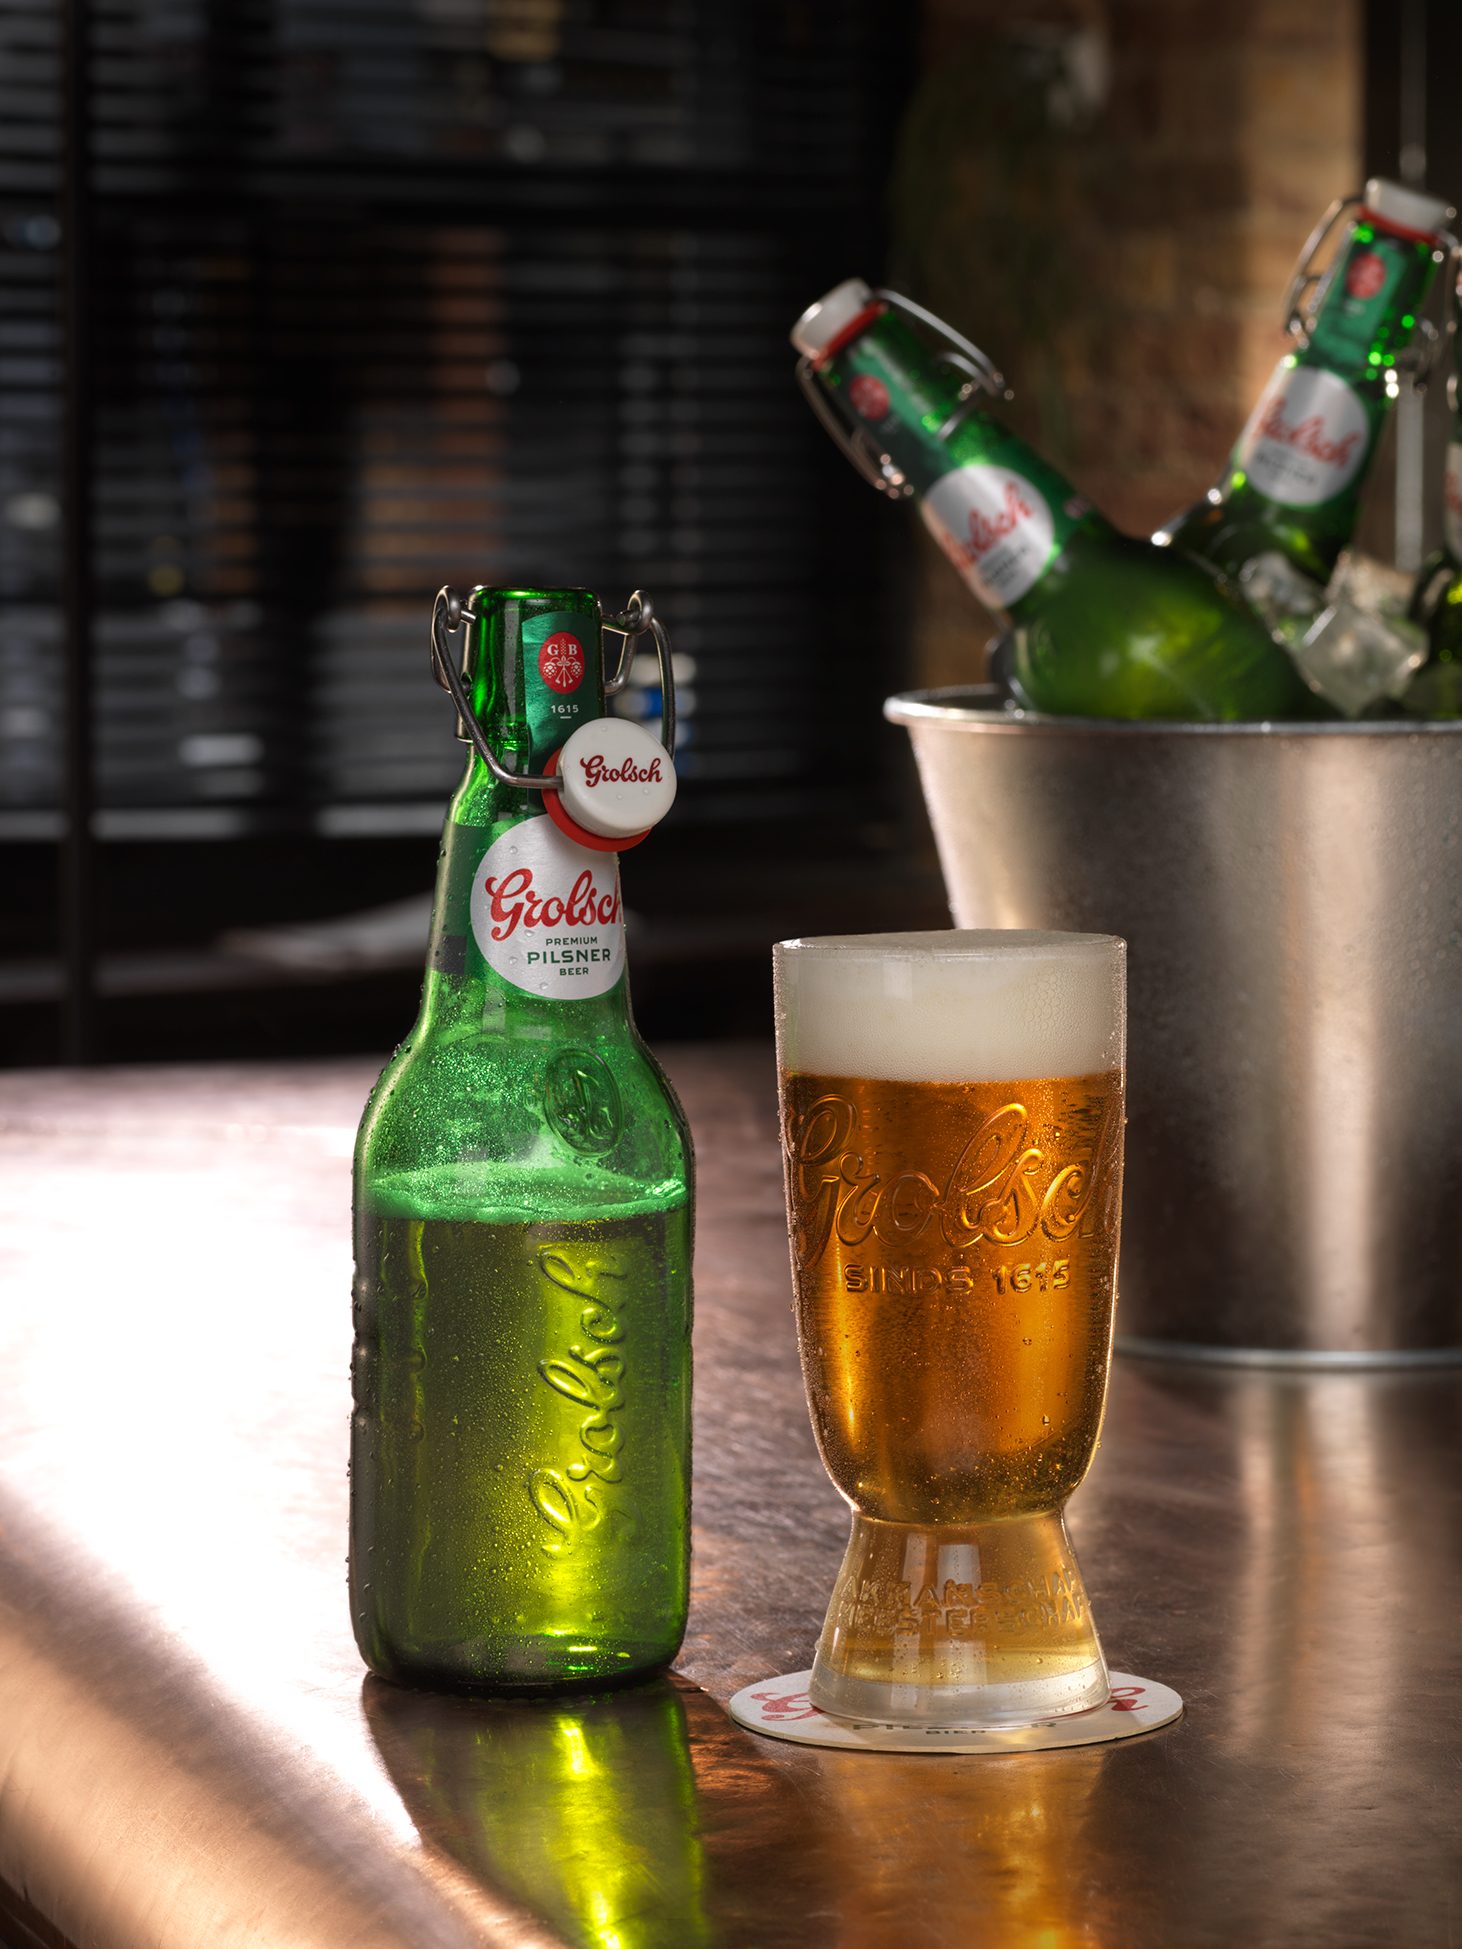 Grolsch: brand returns with 4% pilsner